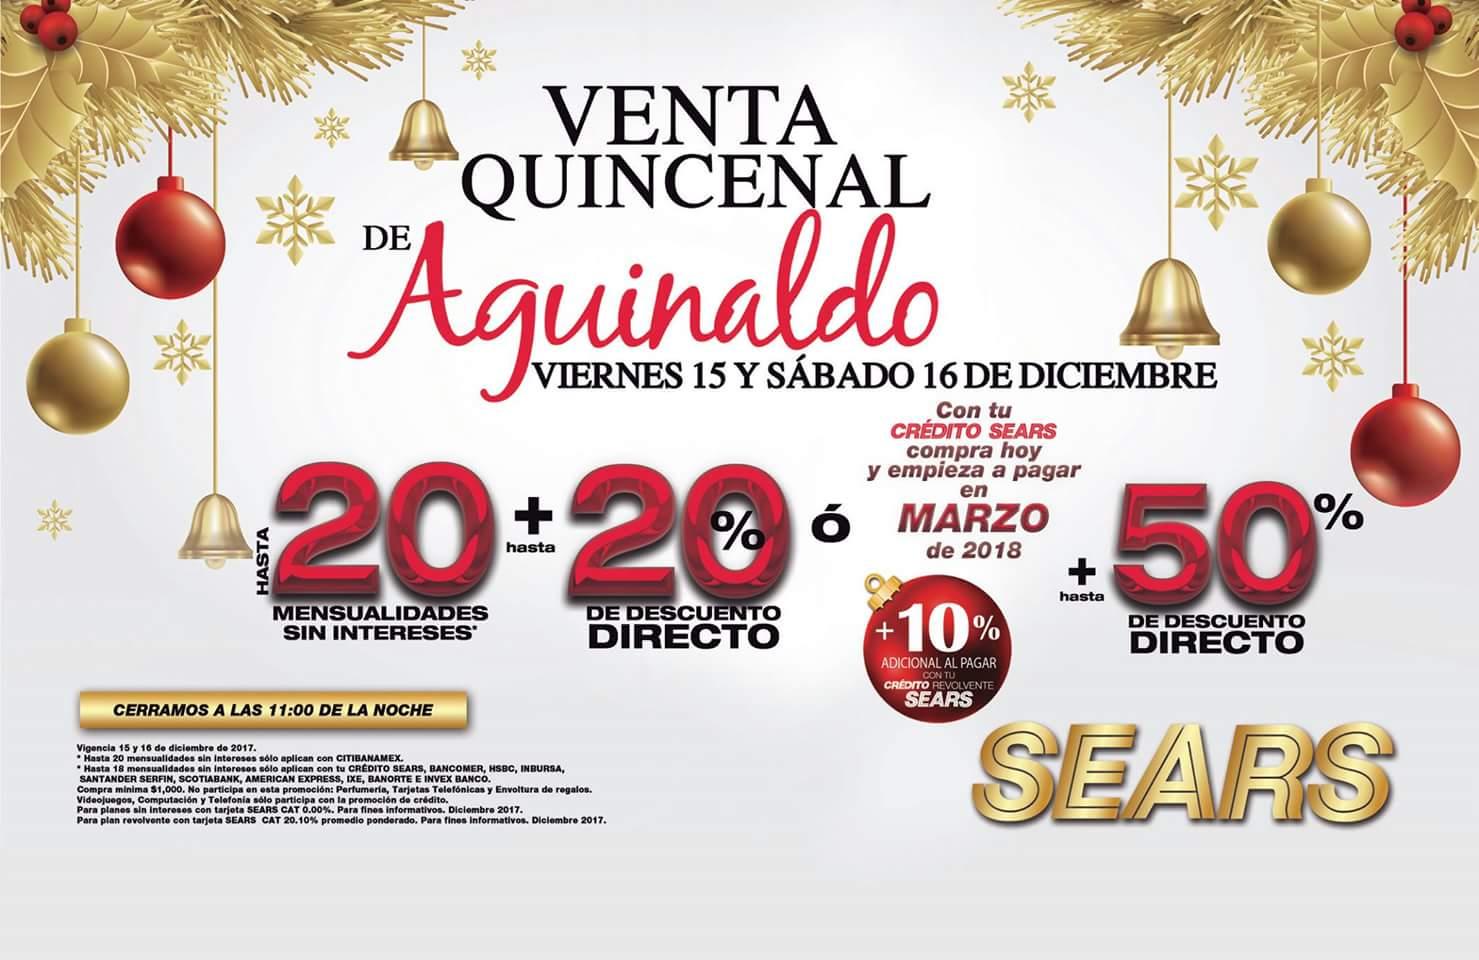 880e2d16b Venta Quincenal de Aguinaldo Sears 15 y 16 de Diciembre de 2017